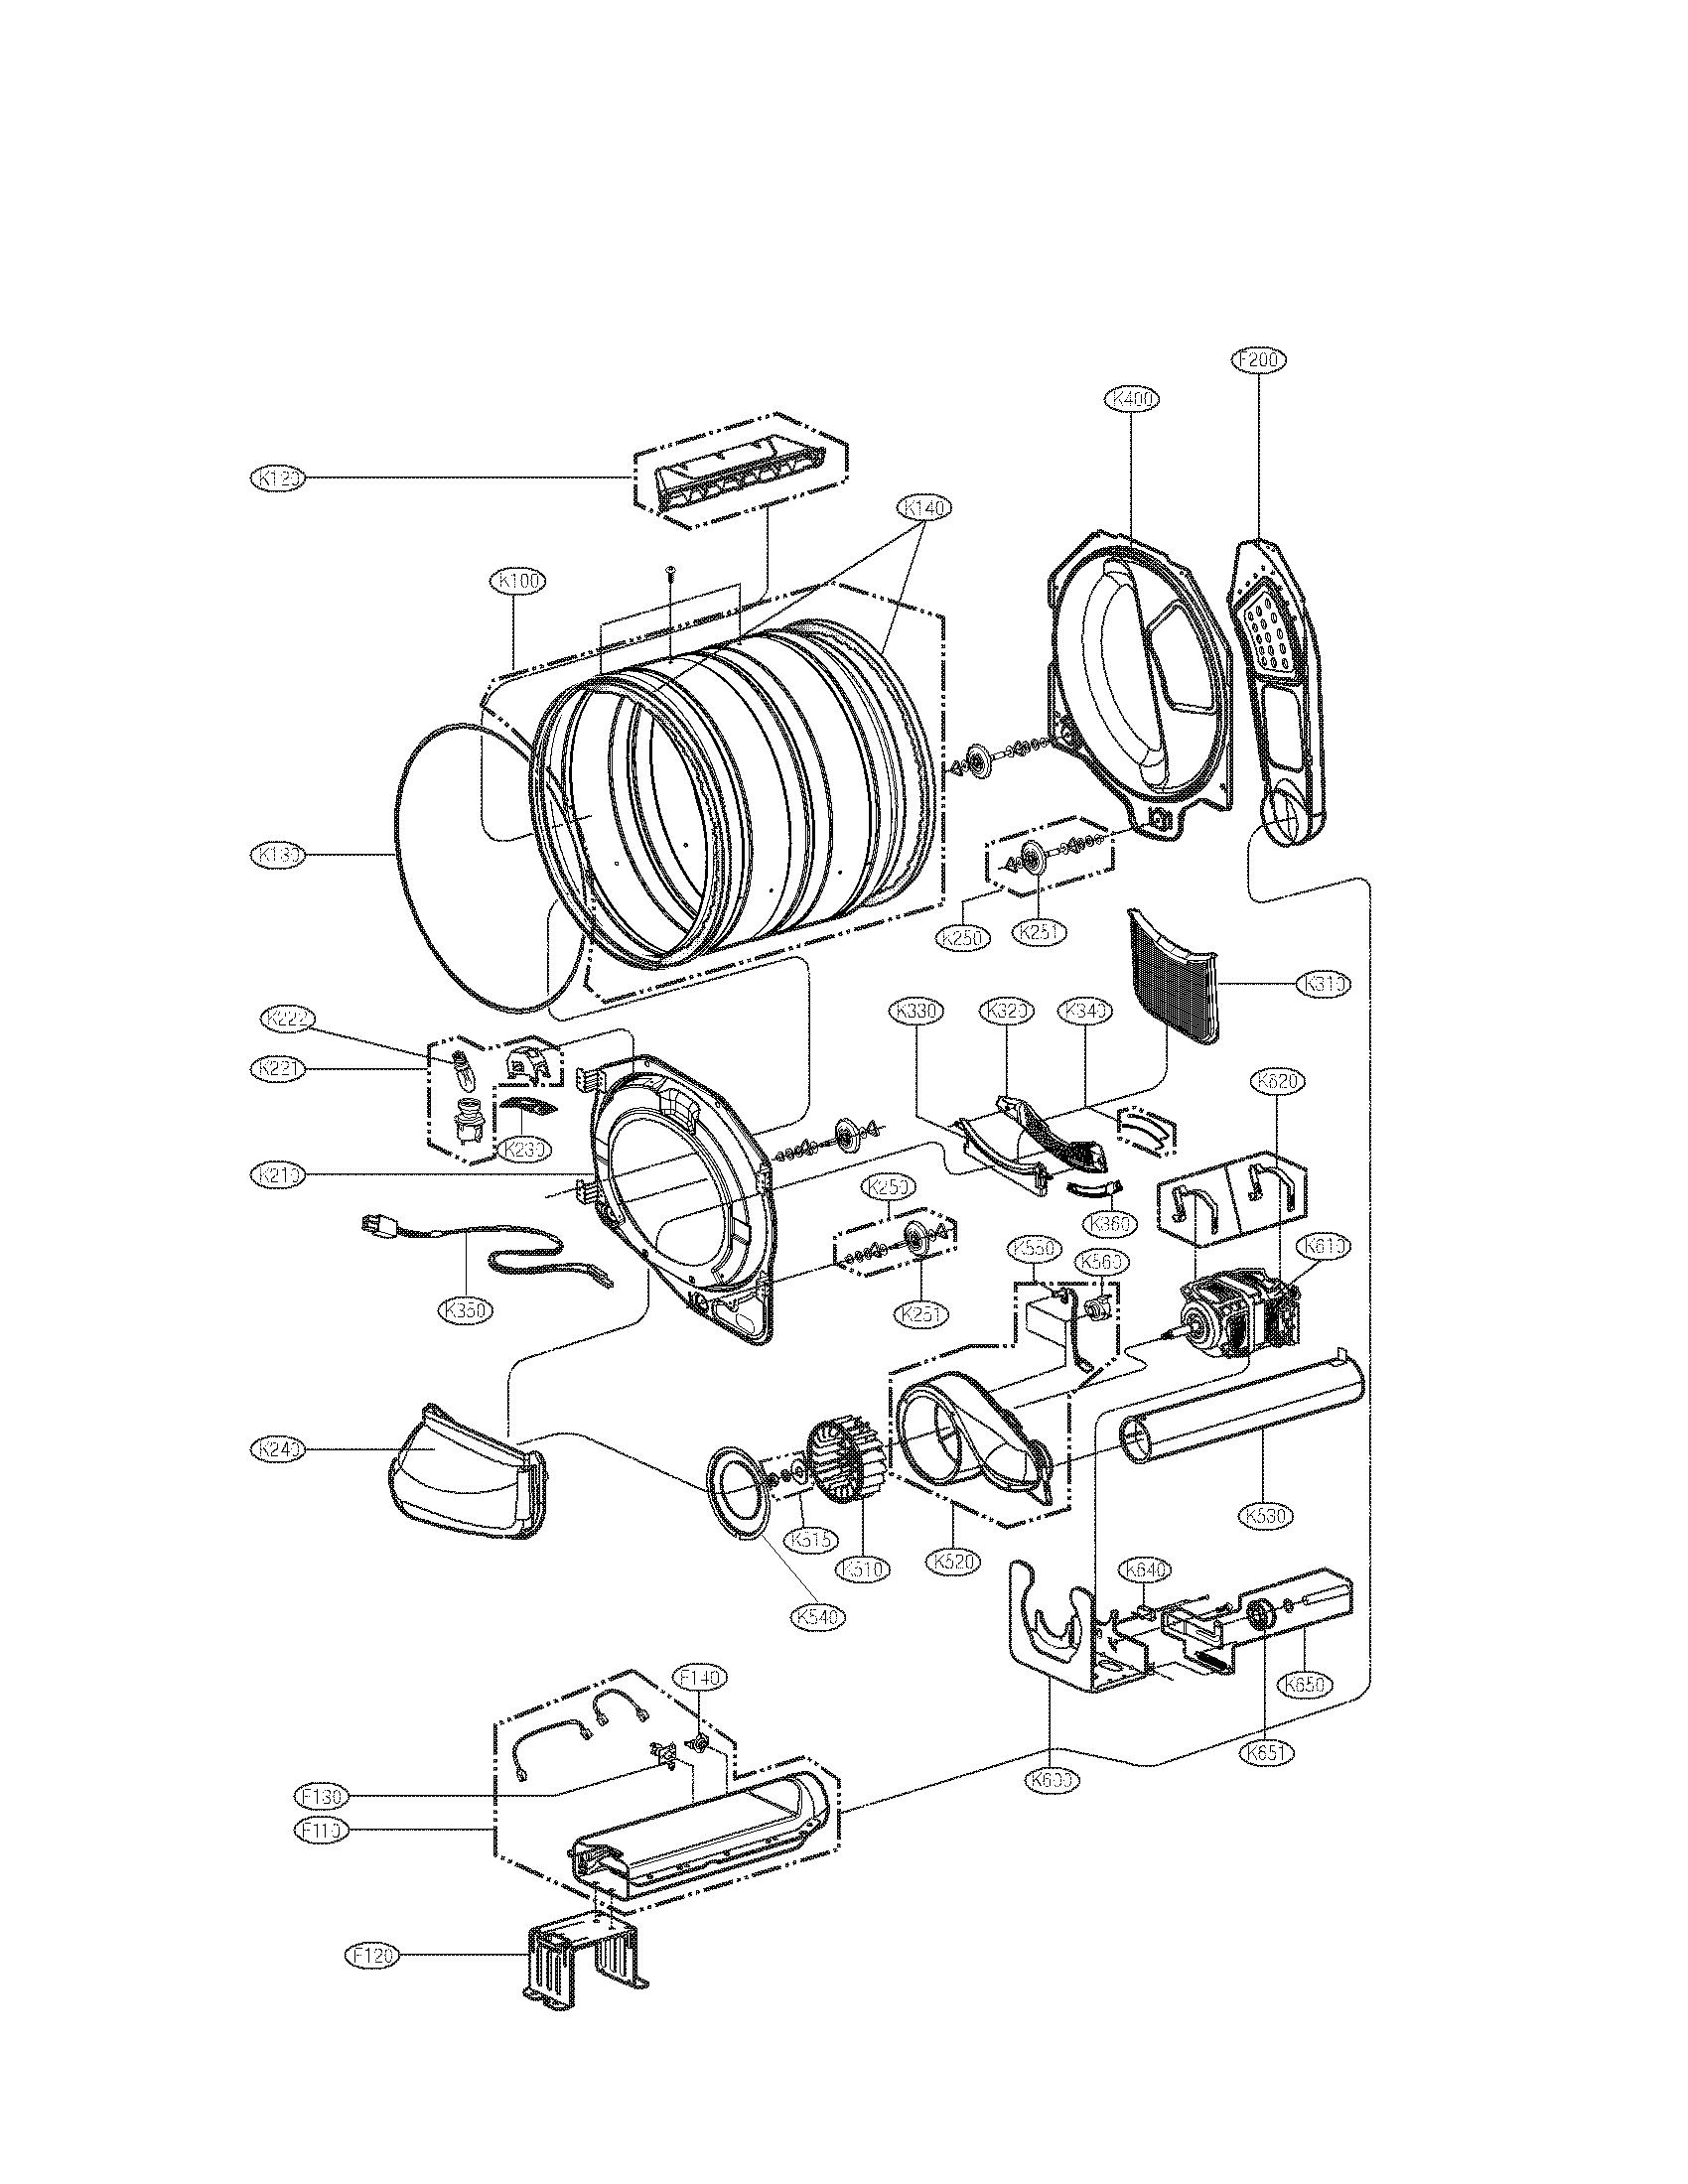 lg dle2532w hi-limit thermostat